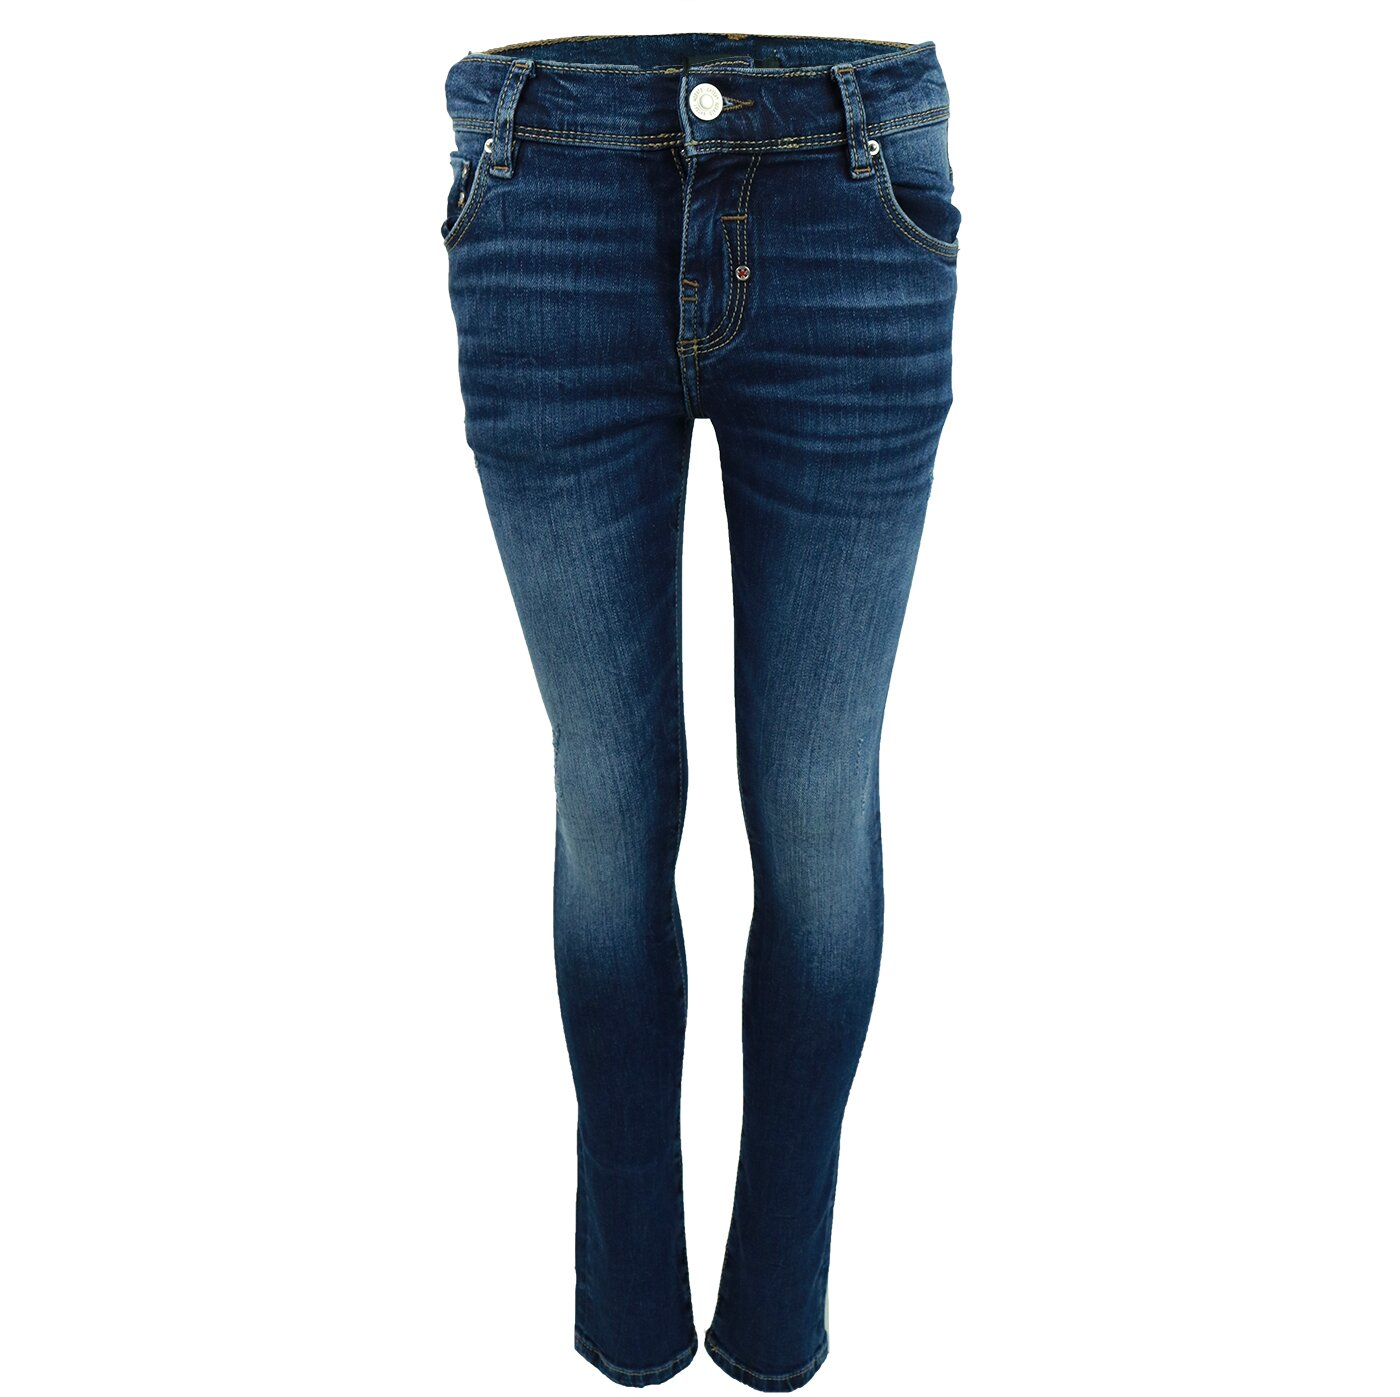 Antony Morato Fighetto Jeans 0279